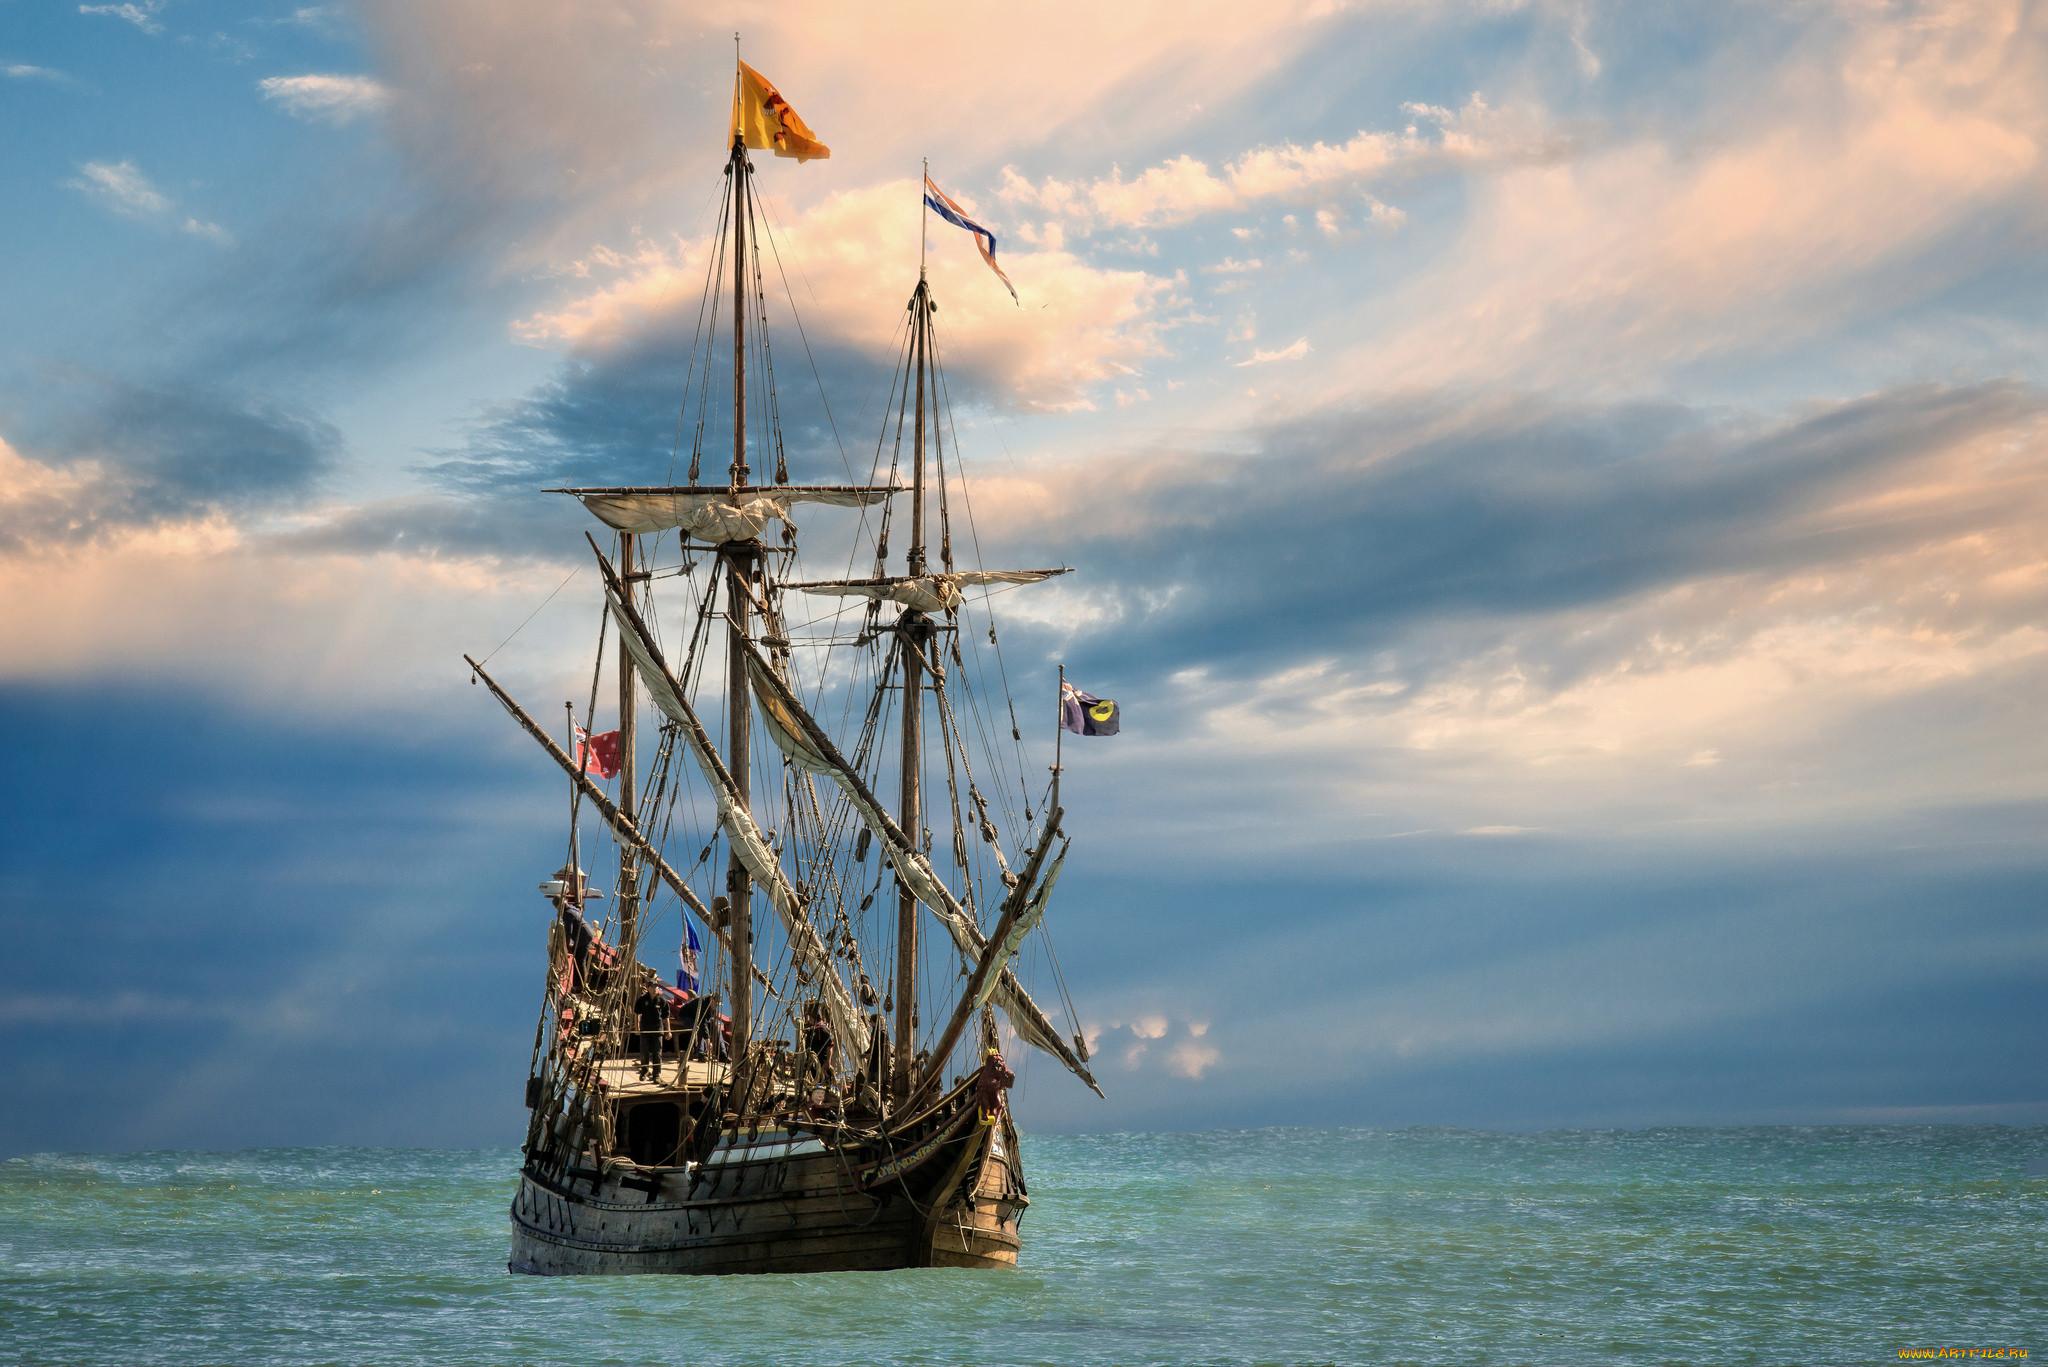 картинки с морскими кораблями искажений происходит